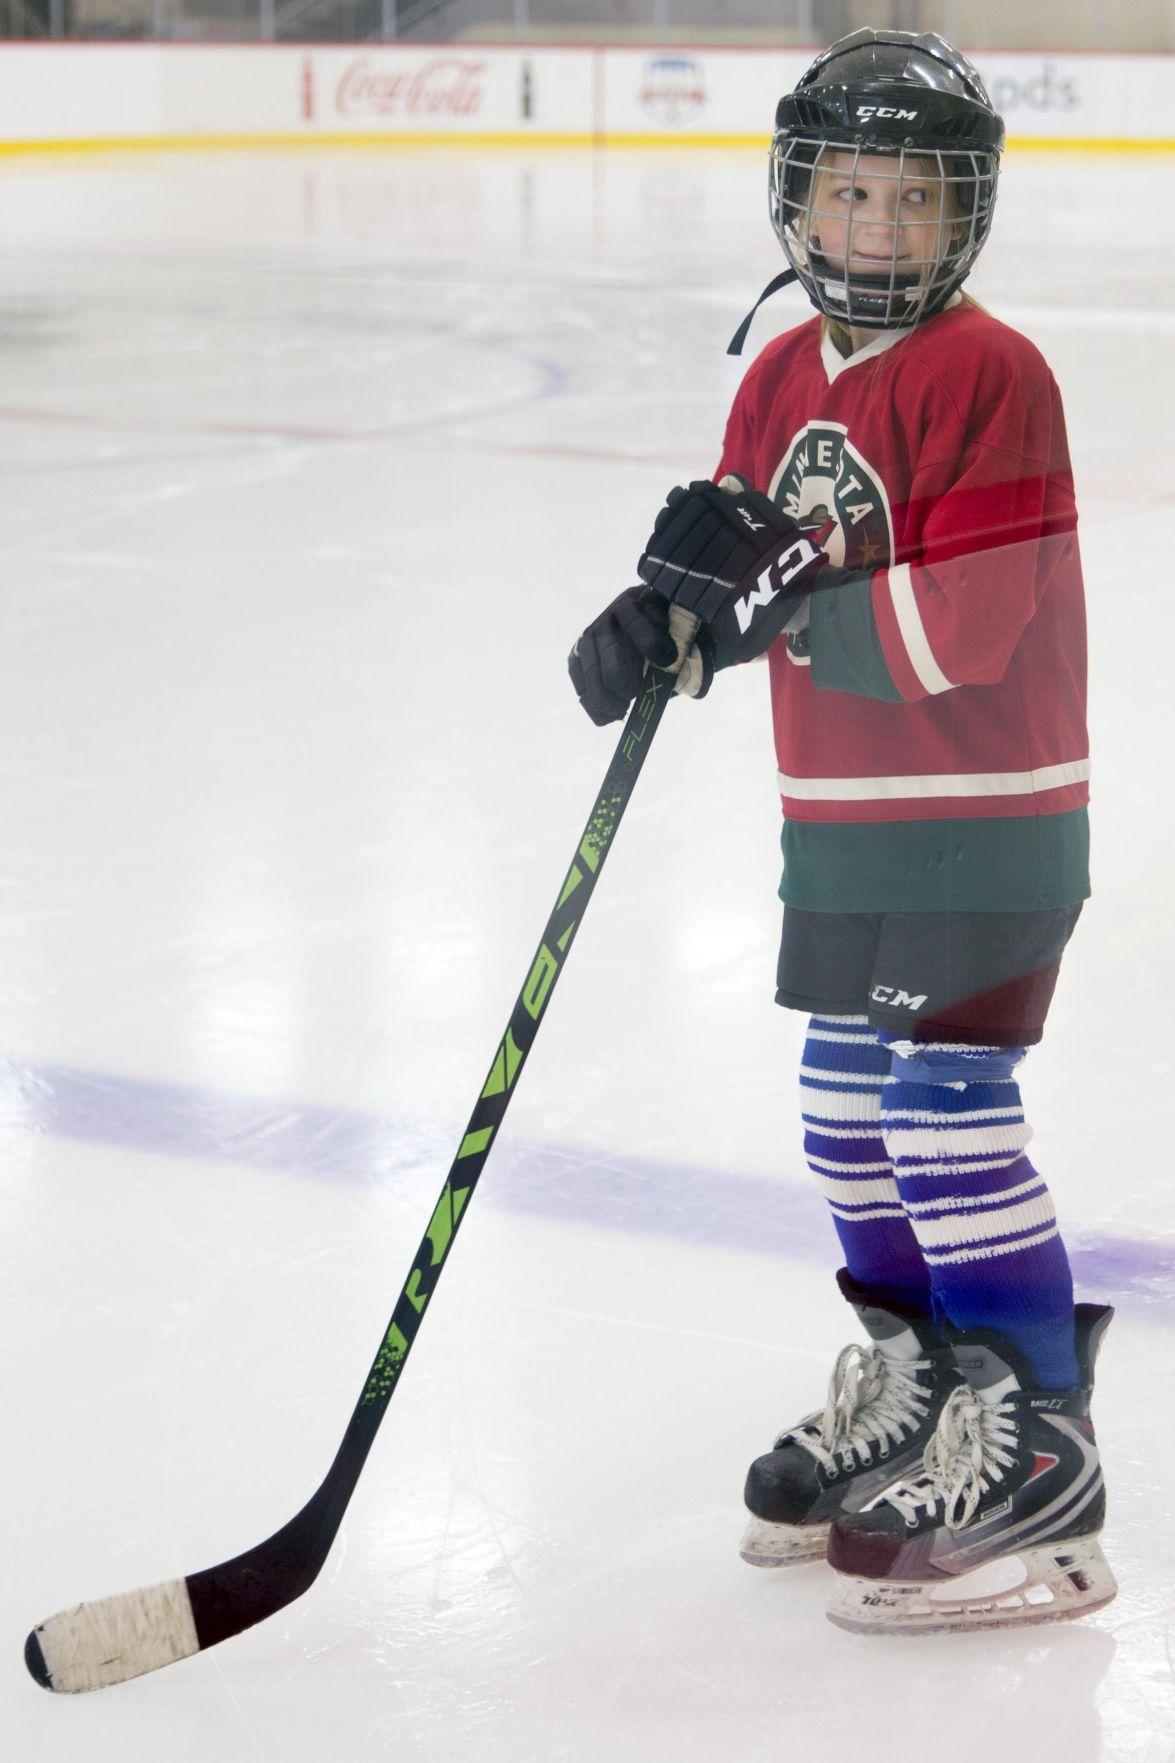 Cambridge girl featured in Minnesota Wild video